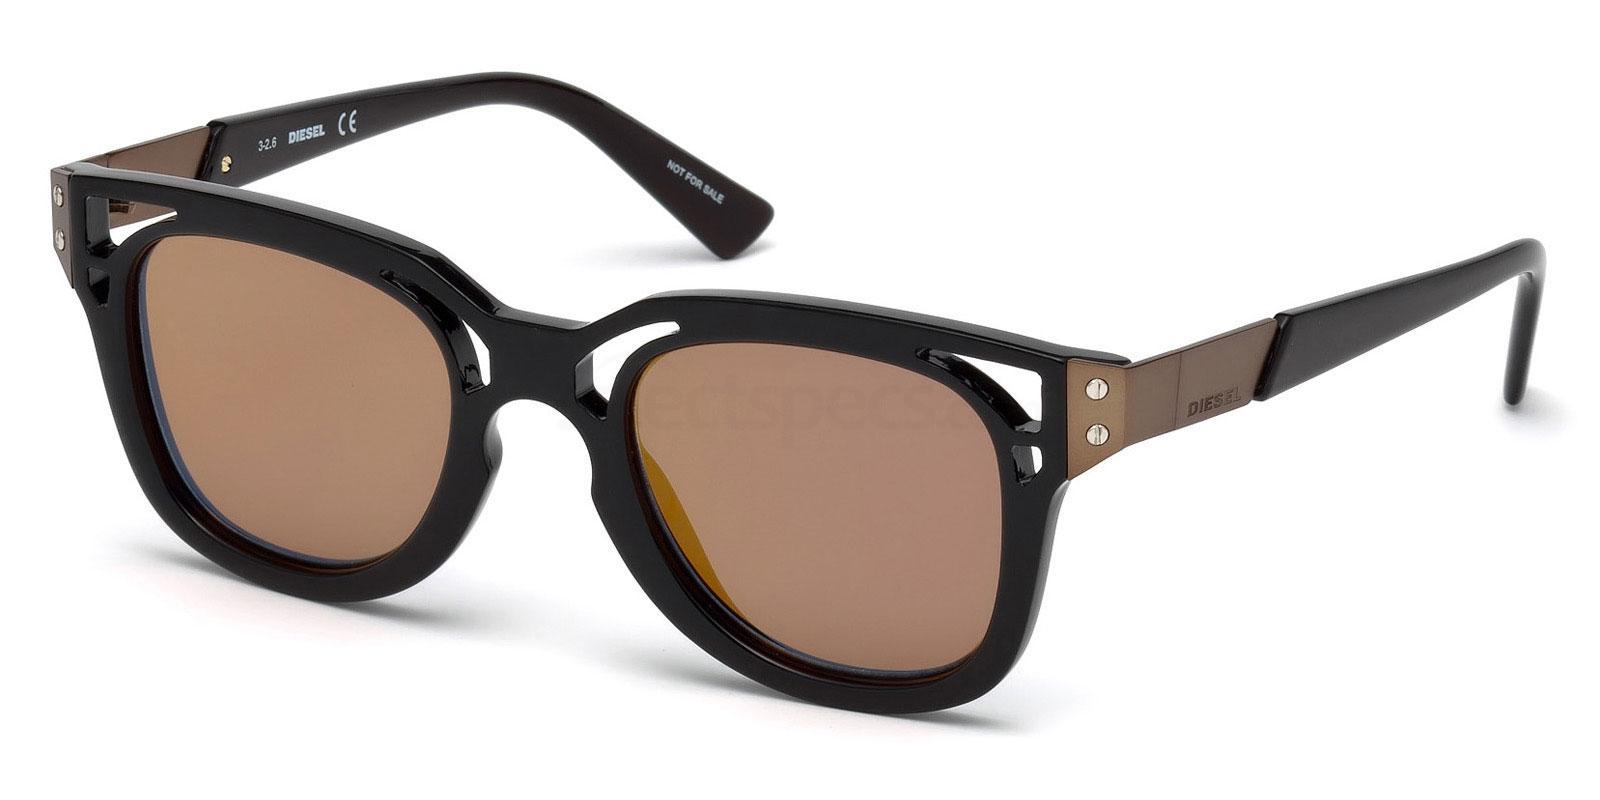 01X DL0232 Sunglasses, Diesel